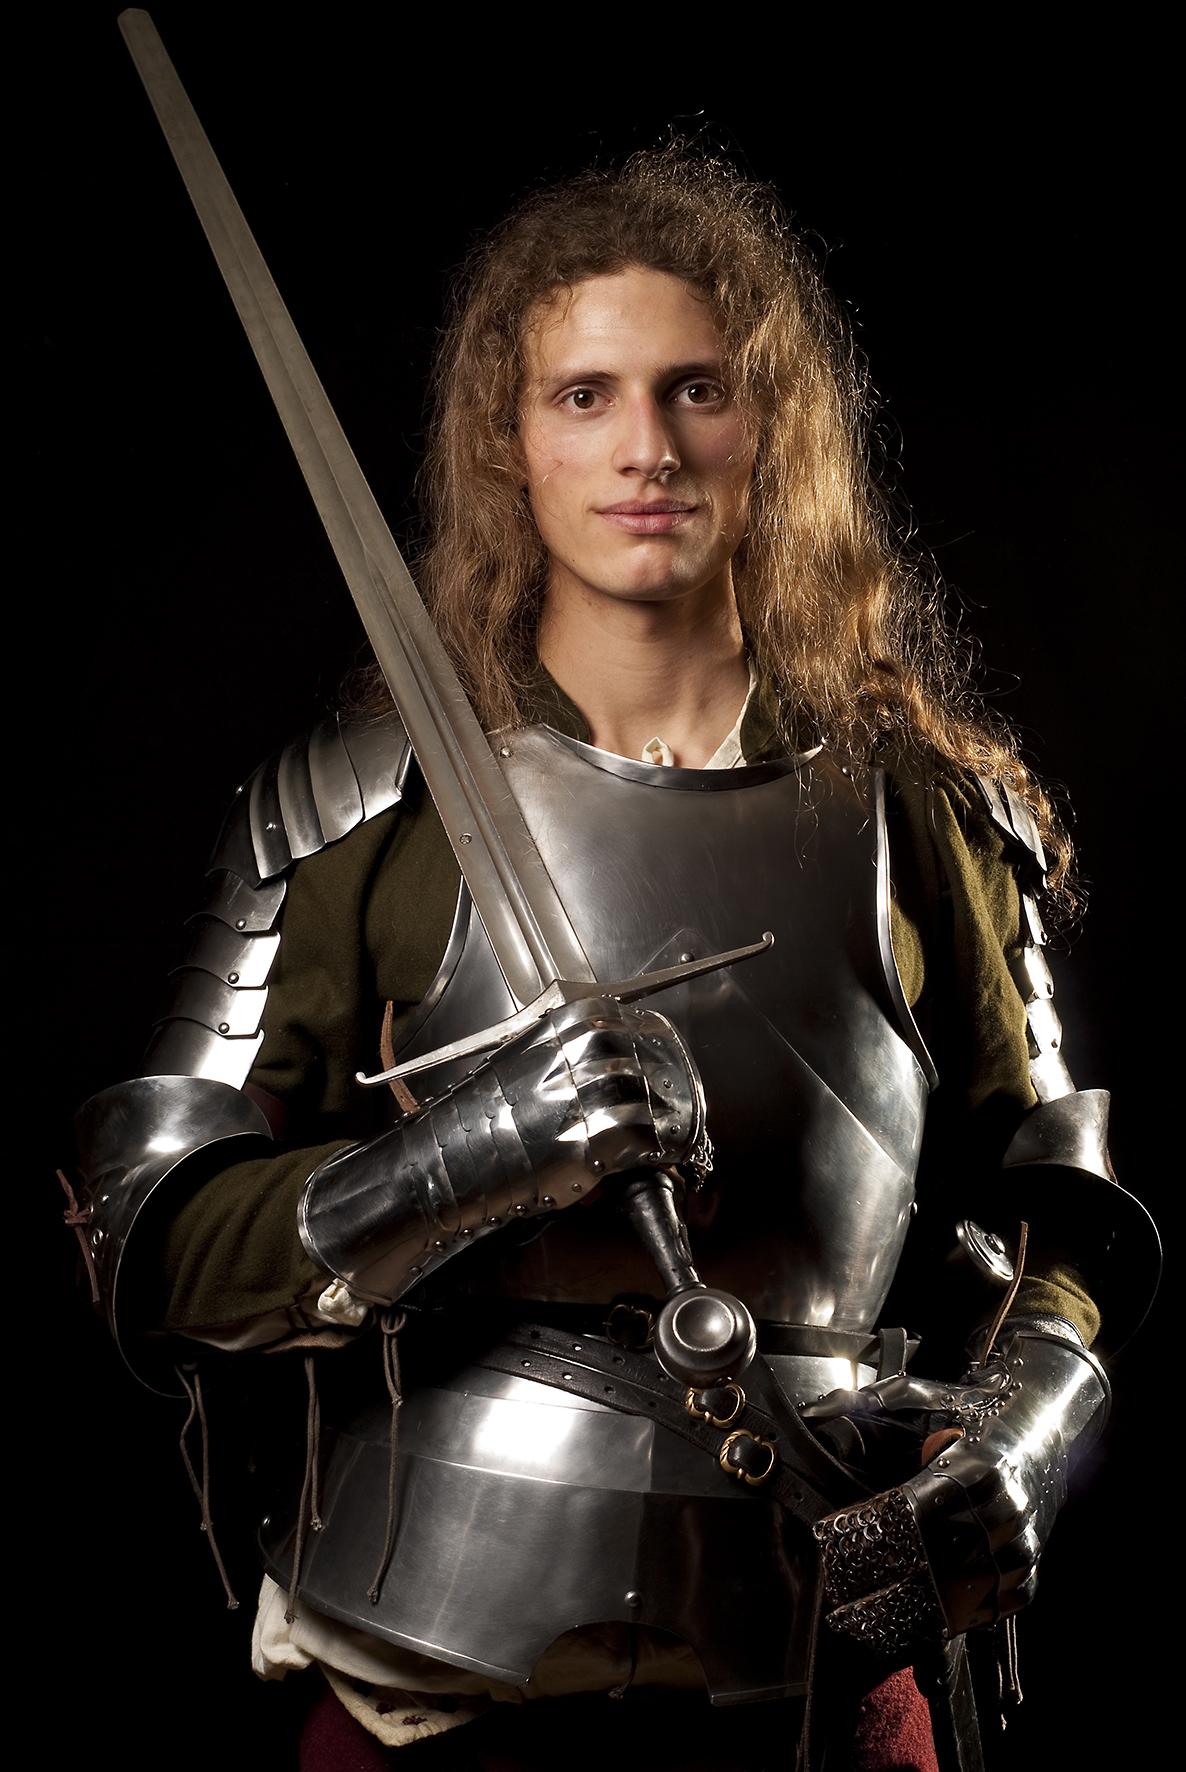 Jeune chevalier italien